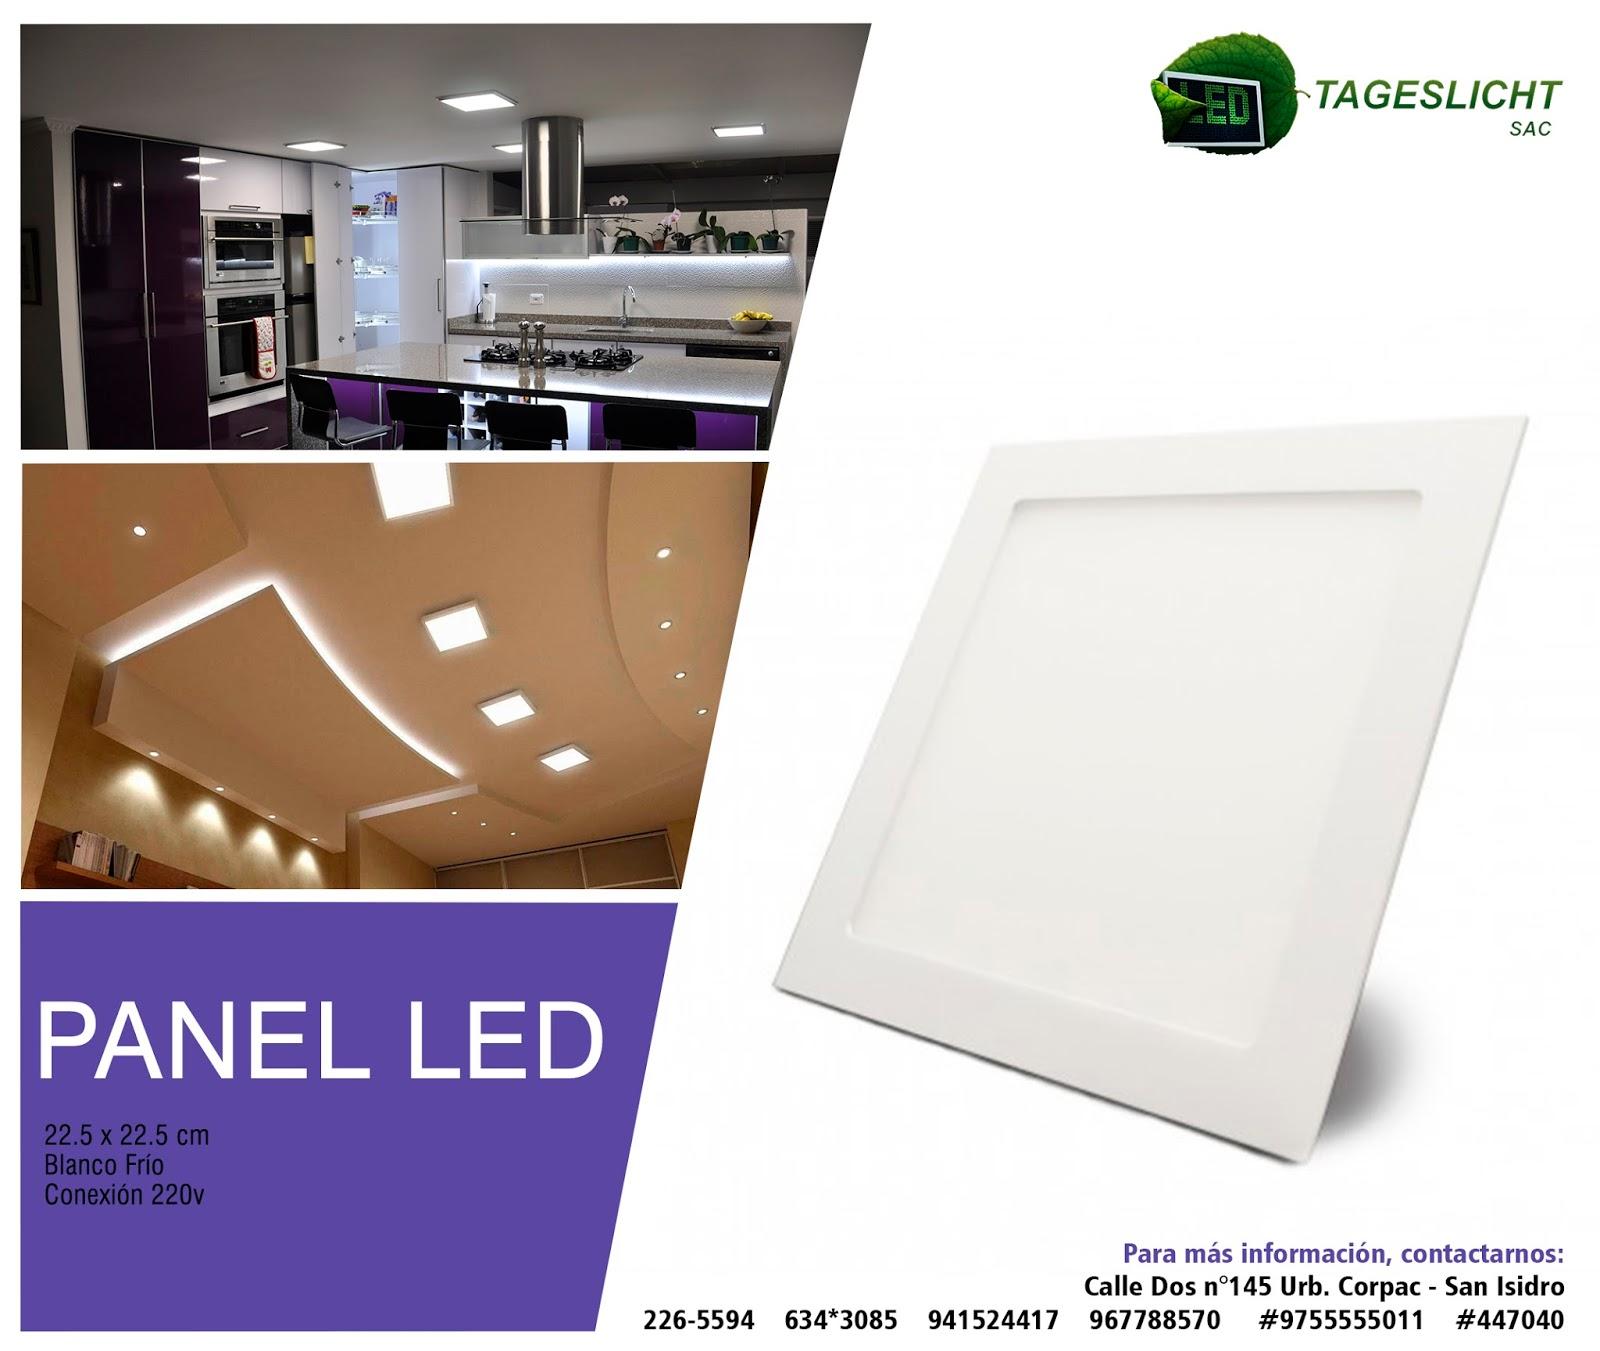 tageslicht iluminaci n led panel led 22 5 x 22 5 cm. Black Bedroom Furniture Sets. Home Design Ideas